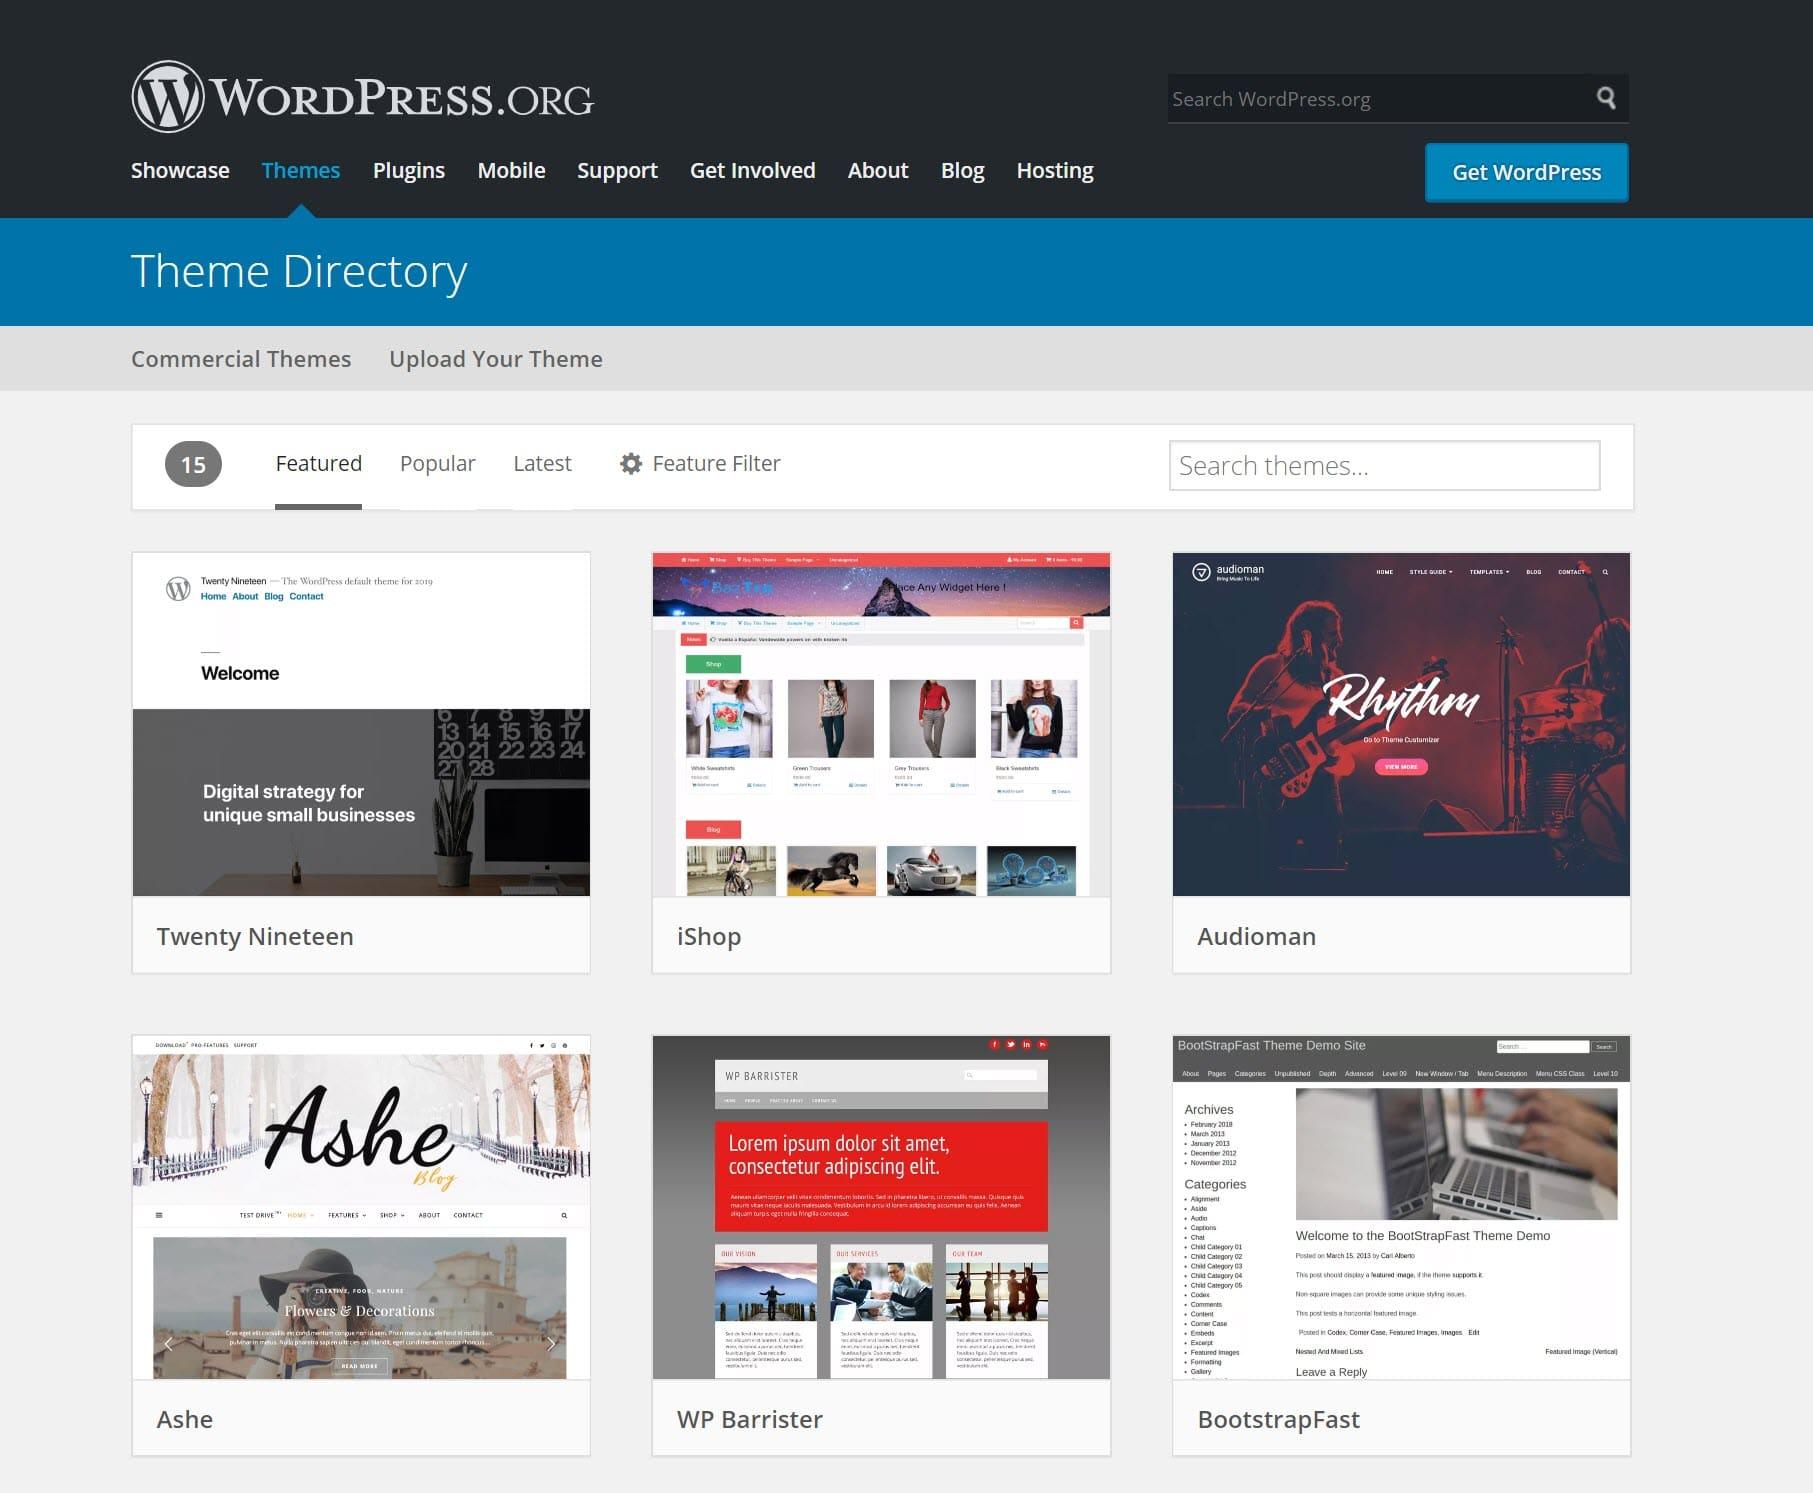 "WordPress-plugins-directory-homepage""width =""1813""height =""1493""srcset =""https://wpjian.com/wp-content/uploads/2019/05/WordPress-plugins-directory-homepage.jpg 1813w, https://kinsta.com/wp-content/uploads/2019/05/WordPress-plugins-directory-homepage-300x247.jpg 300w,https://kinsta.com/wp-content/uploads/2019/05/WordPress -plugins-directory-homepage-768x632.jpg 768w,https://kinsta.com/wp-content/uploads/2019/05/WordPress-plugins-directory-homepage-1024x843.jpg 1024w""sizes =""(max-width :1813px)100vw,1813px""><p class="